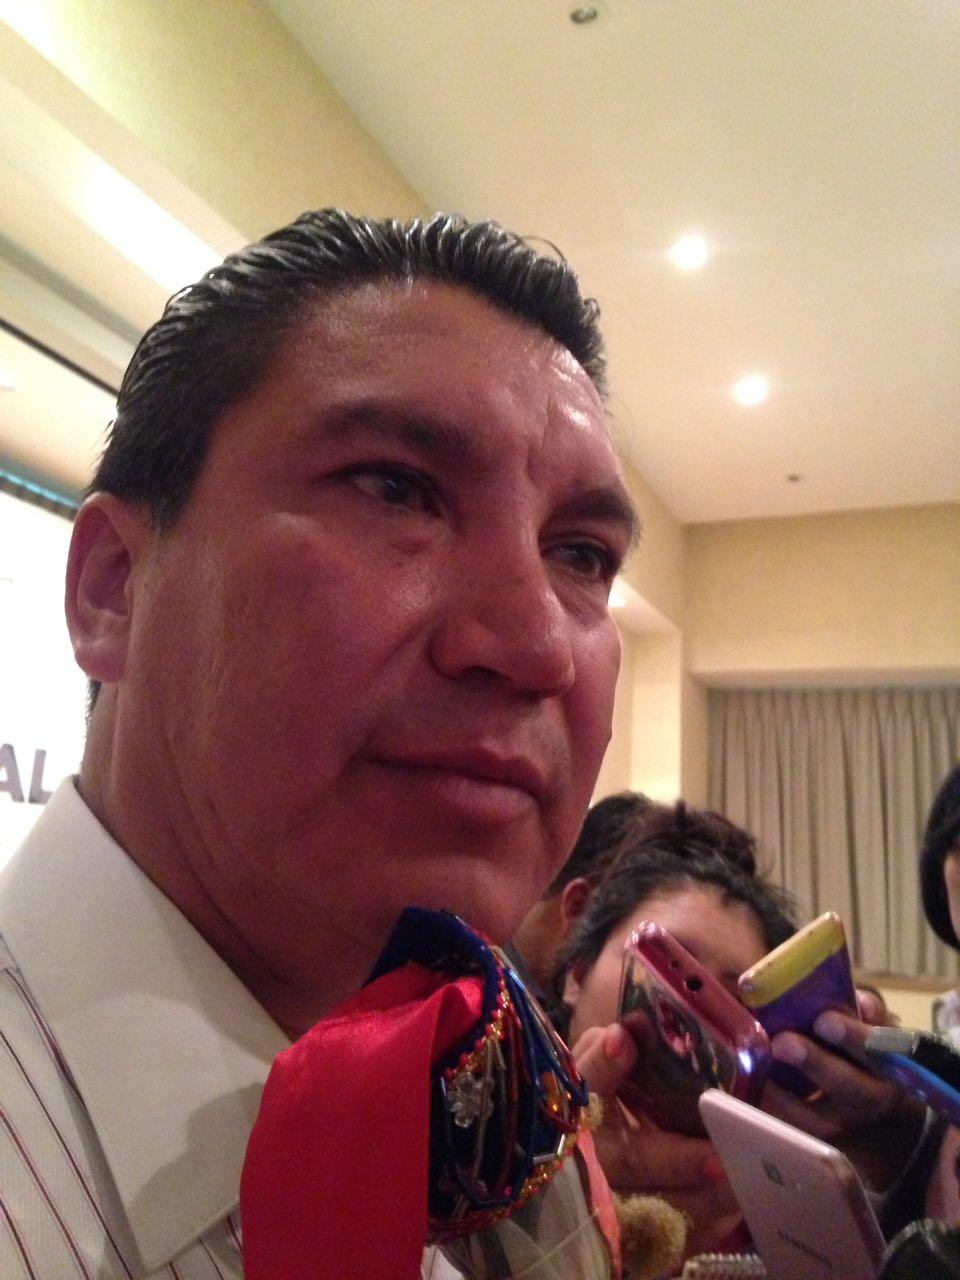 Nativitas no recibe apoyo del diputado Federal;  Oscar Murias Juárez